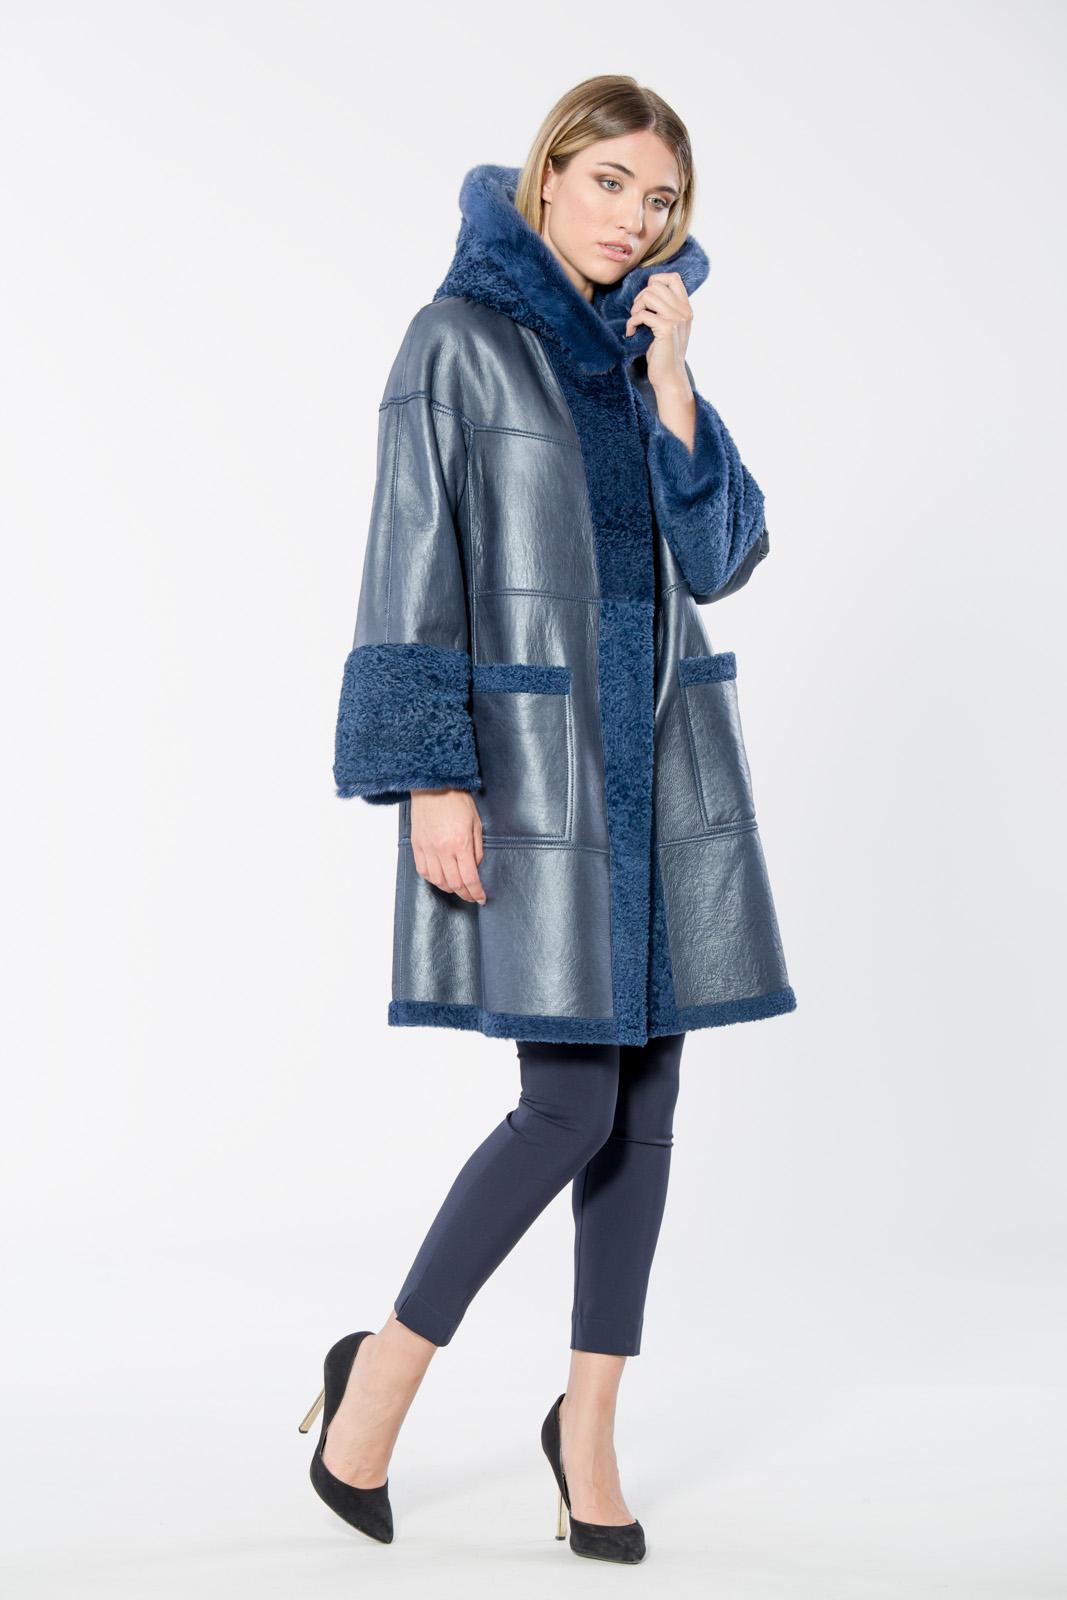 ARNARA K leather side.jpg